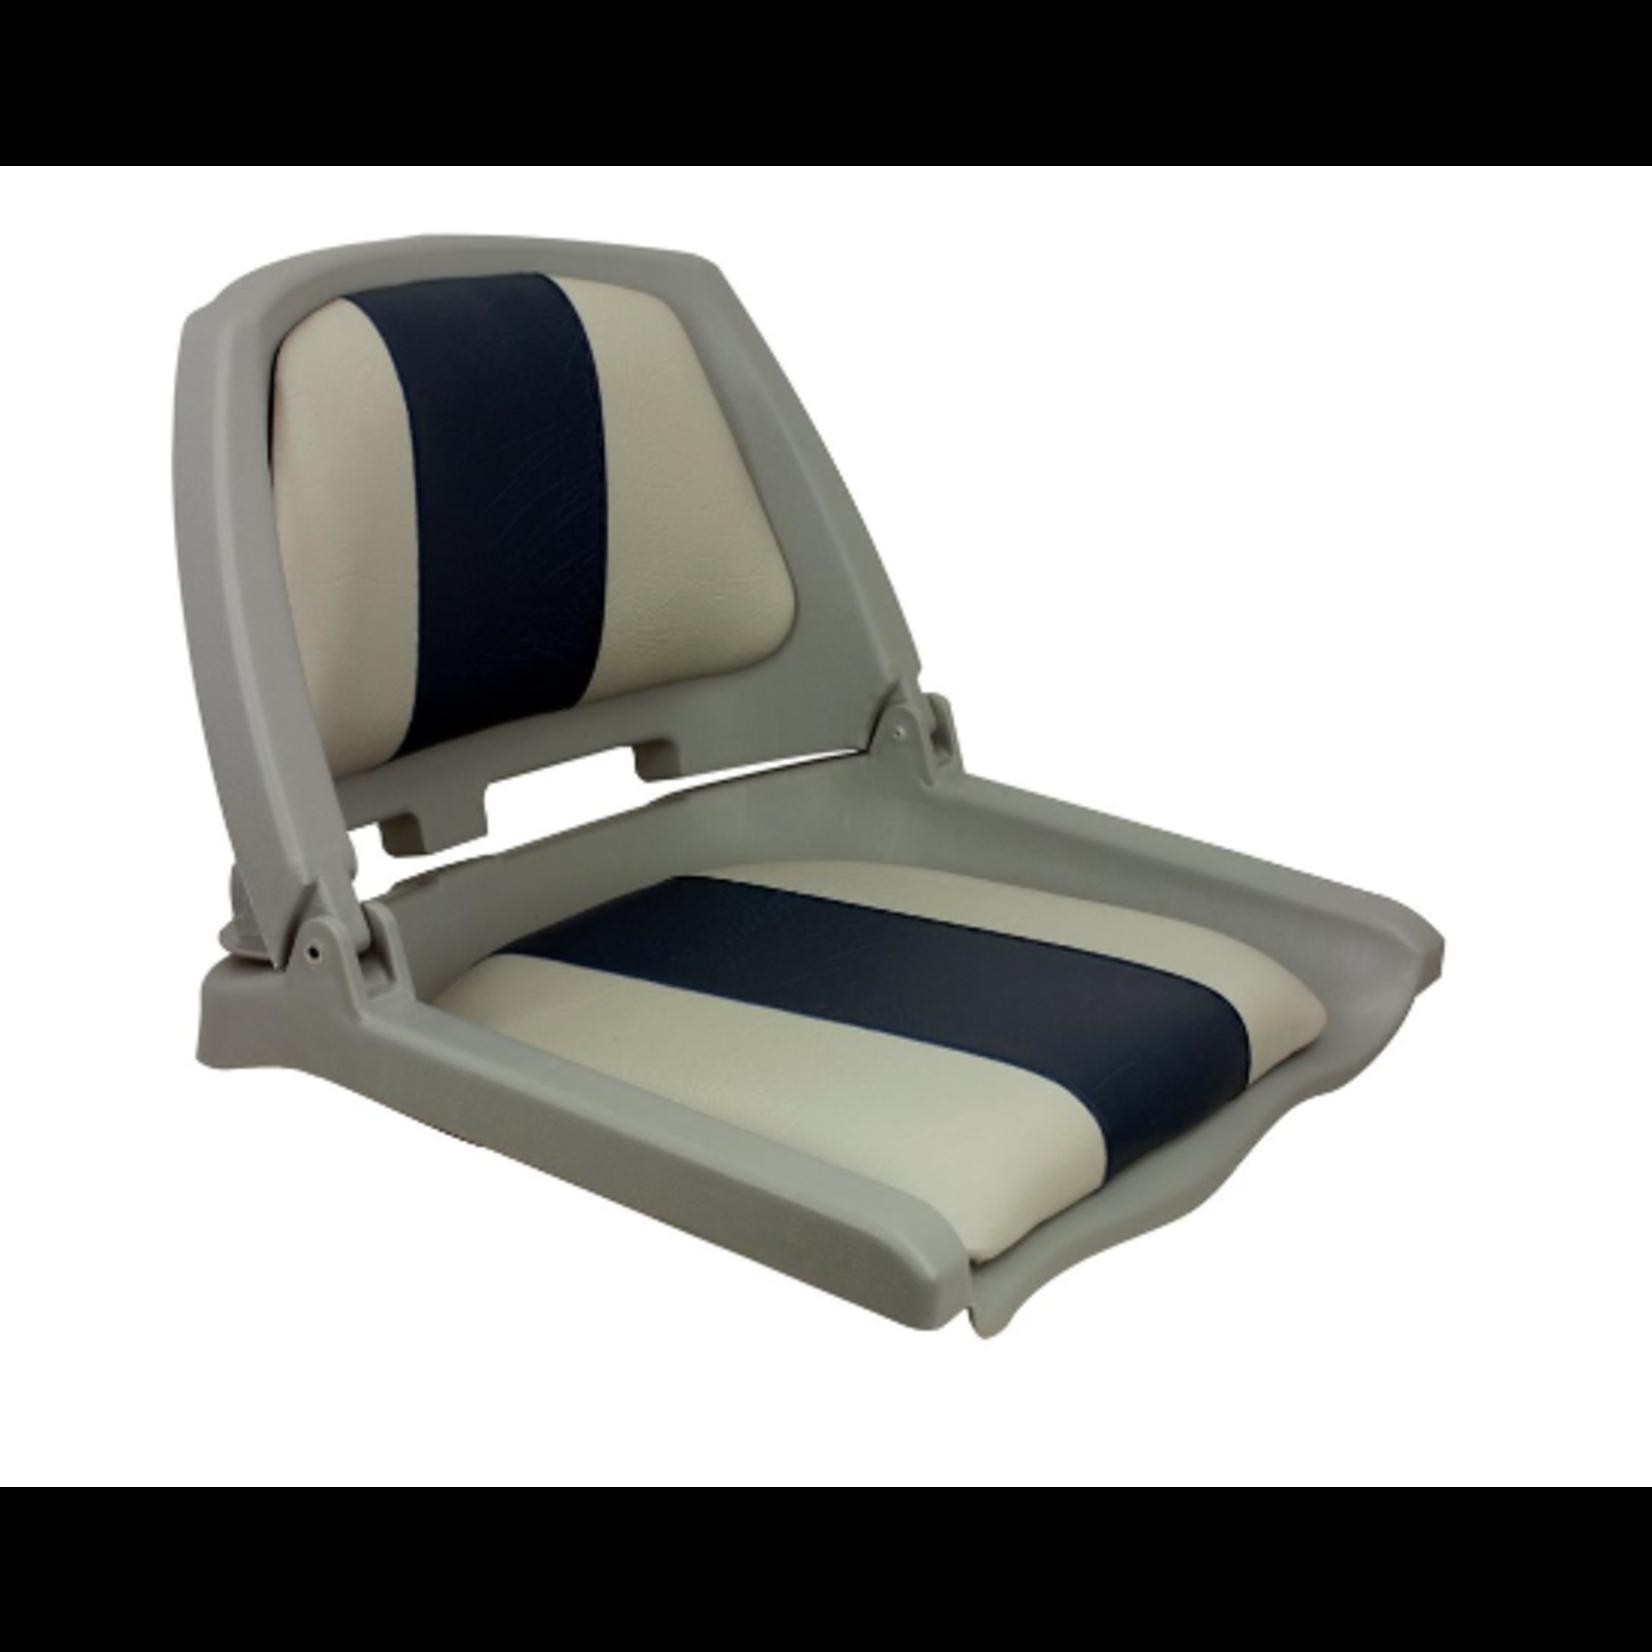 Allpa Traveler - Folding Boat Seat